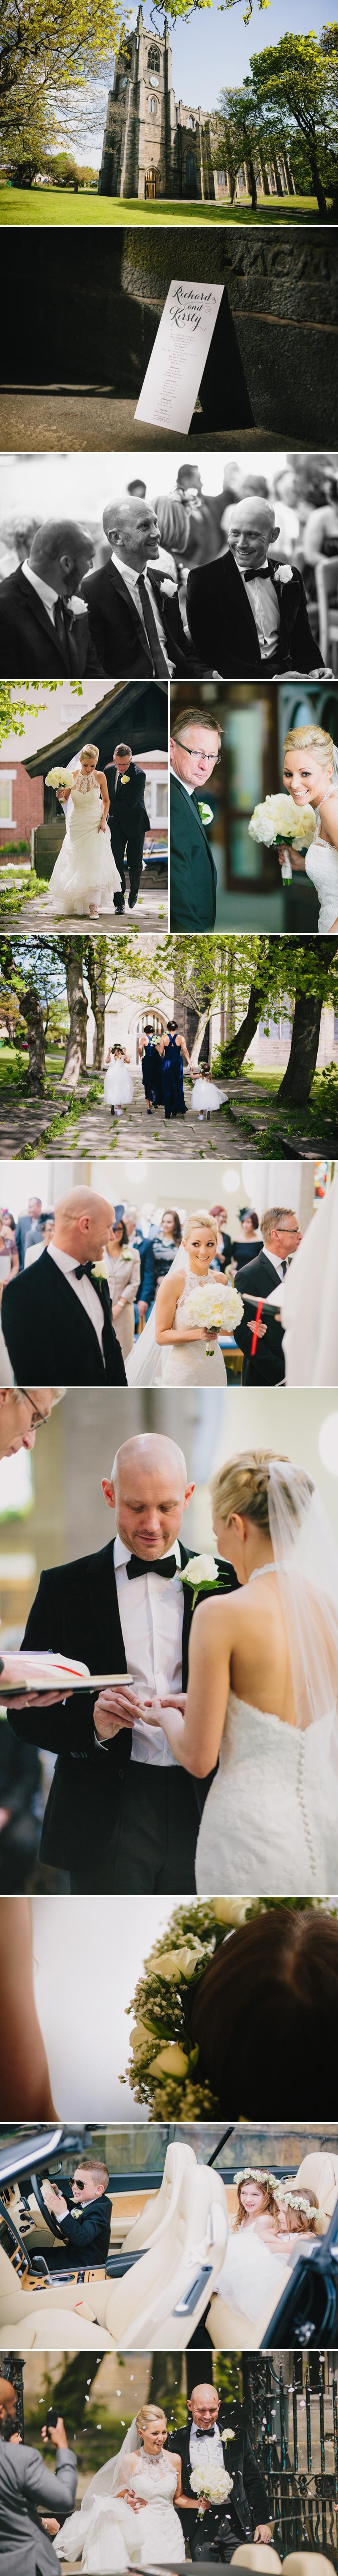 wedding-venues-in-yorkshire-denton-hall-wedding-photography-002a